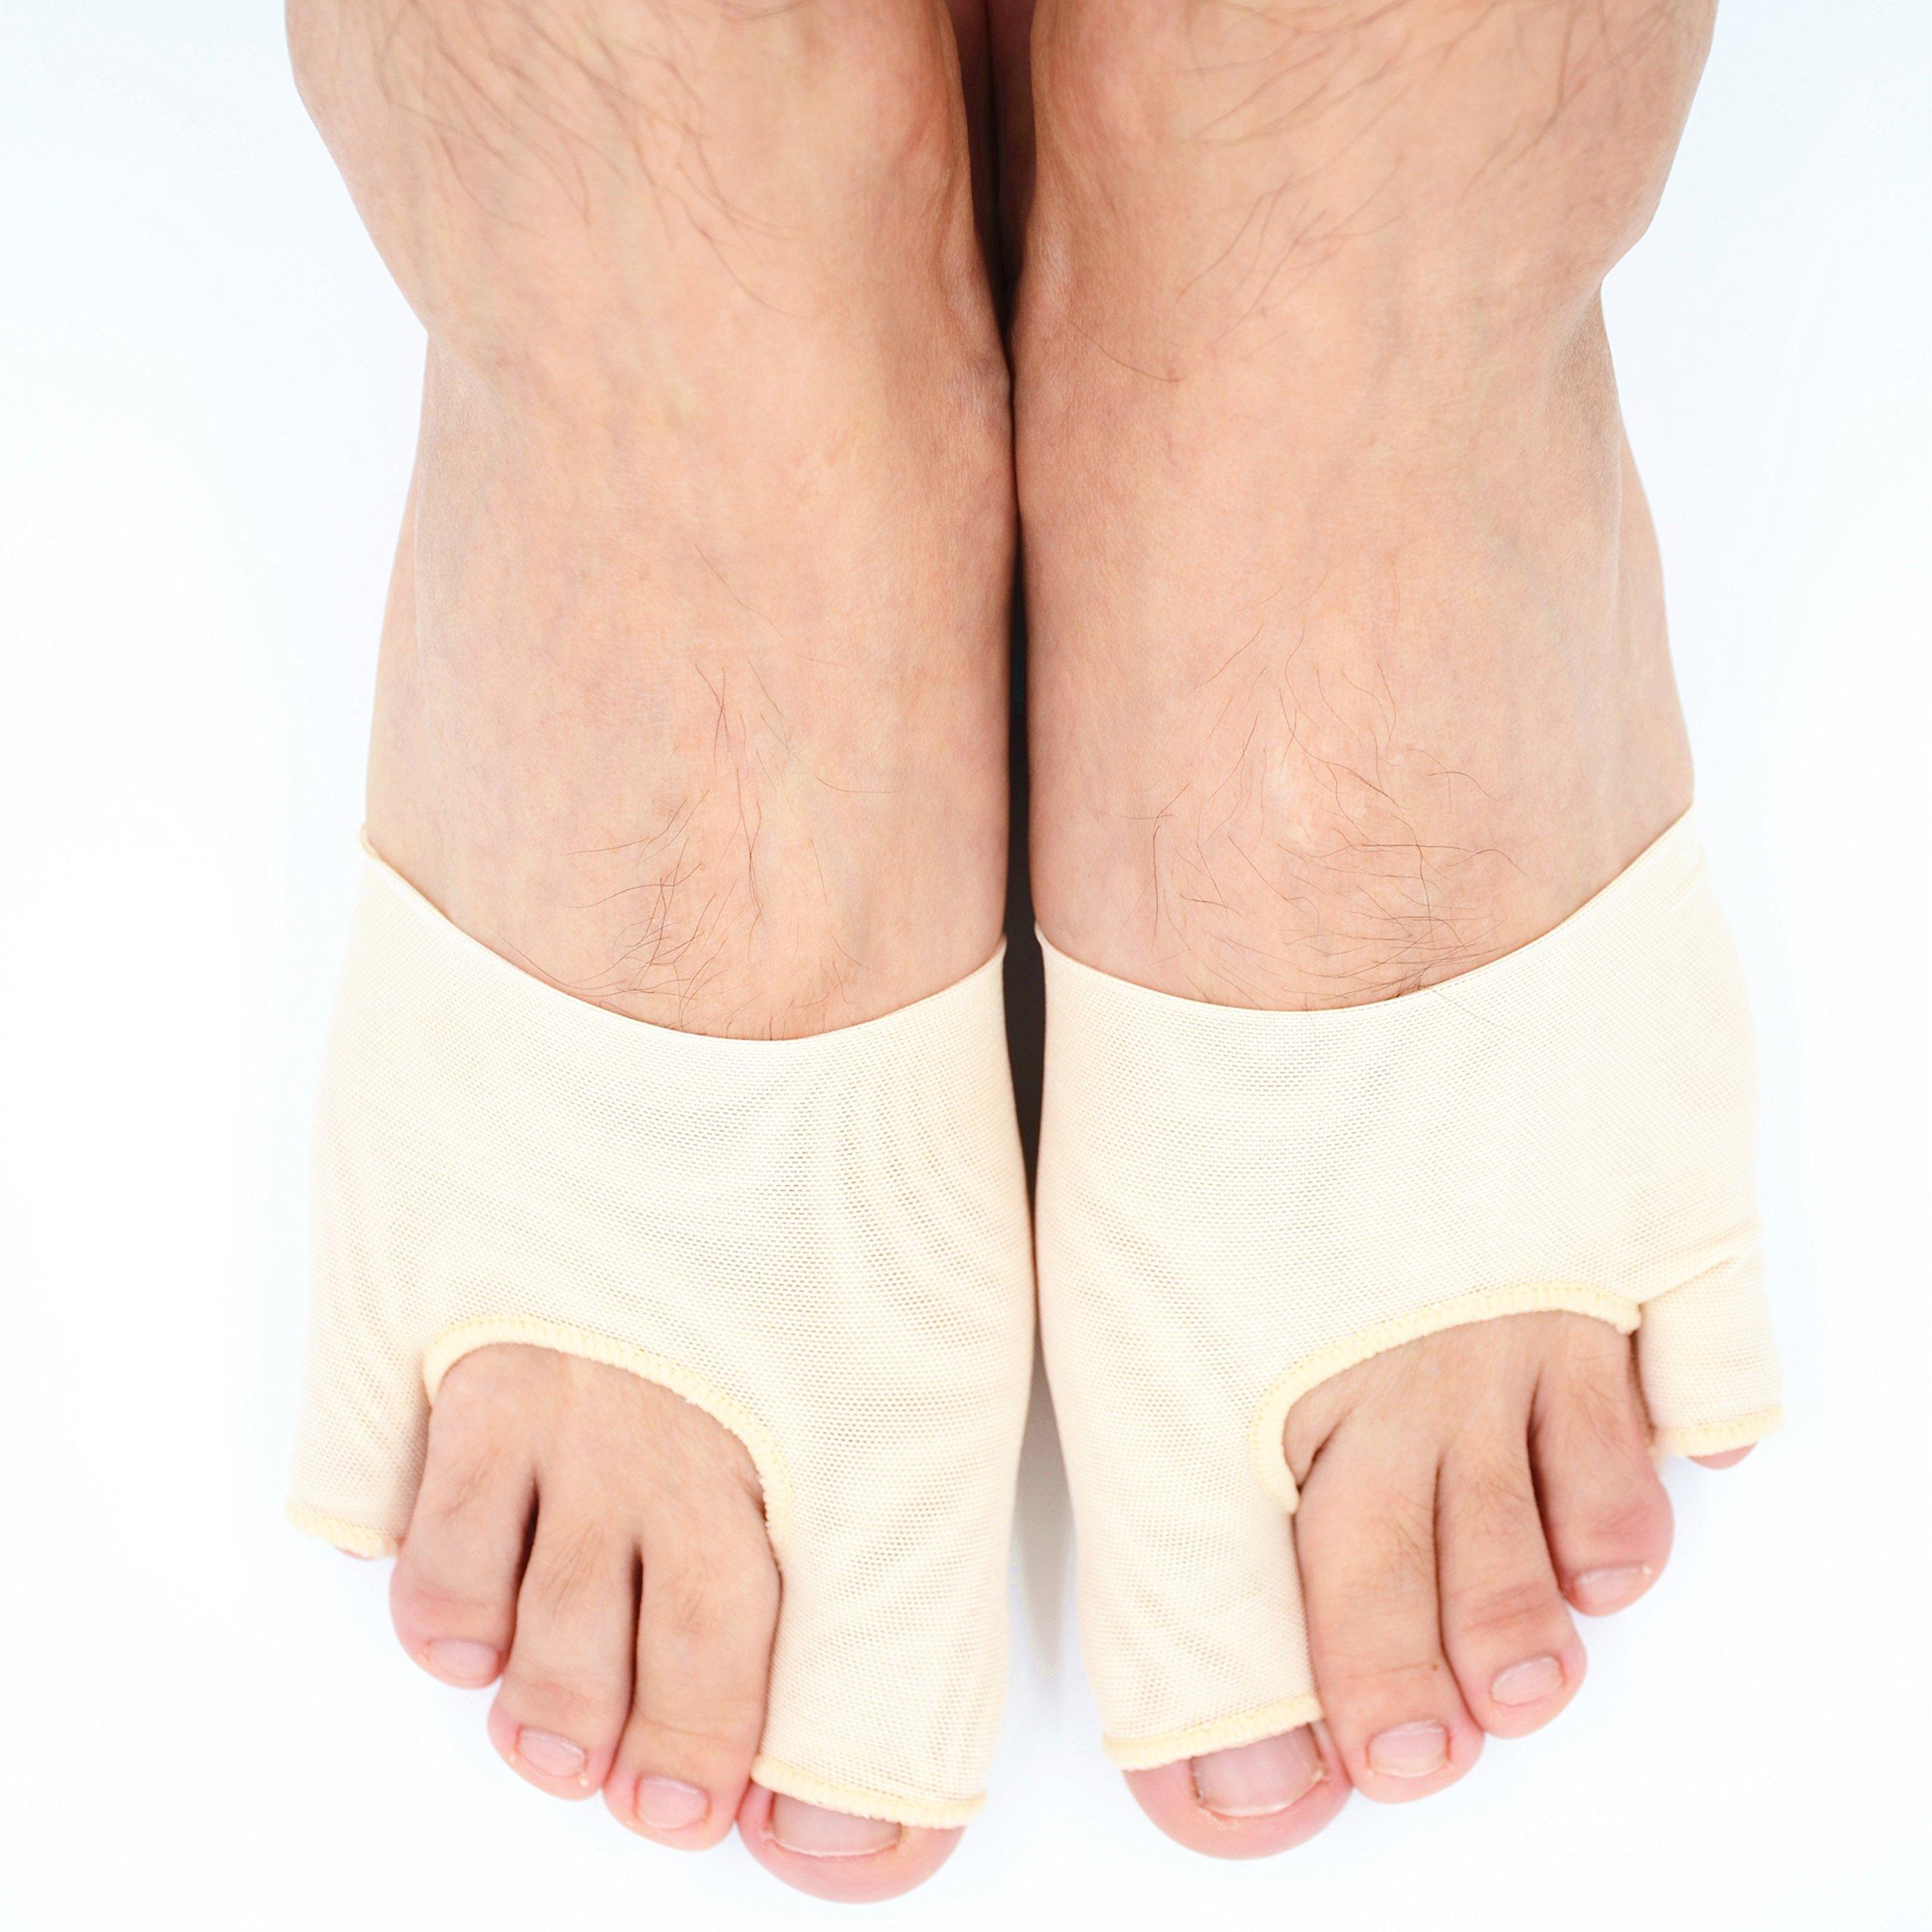 Dr.Koyama Bunion Aid Sleeves Big Toe Bunion Pain Relief Tailor's Bunion Regulator Bunion Toe Straightener Separator Pinky Toe Bunion Protector for High Heels-Small